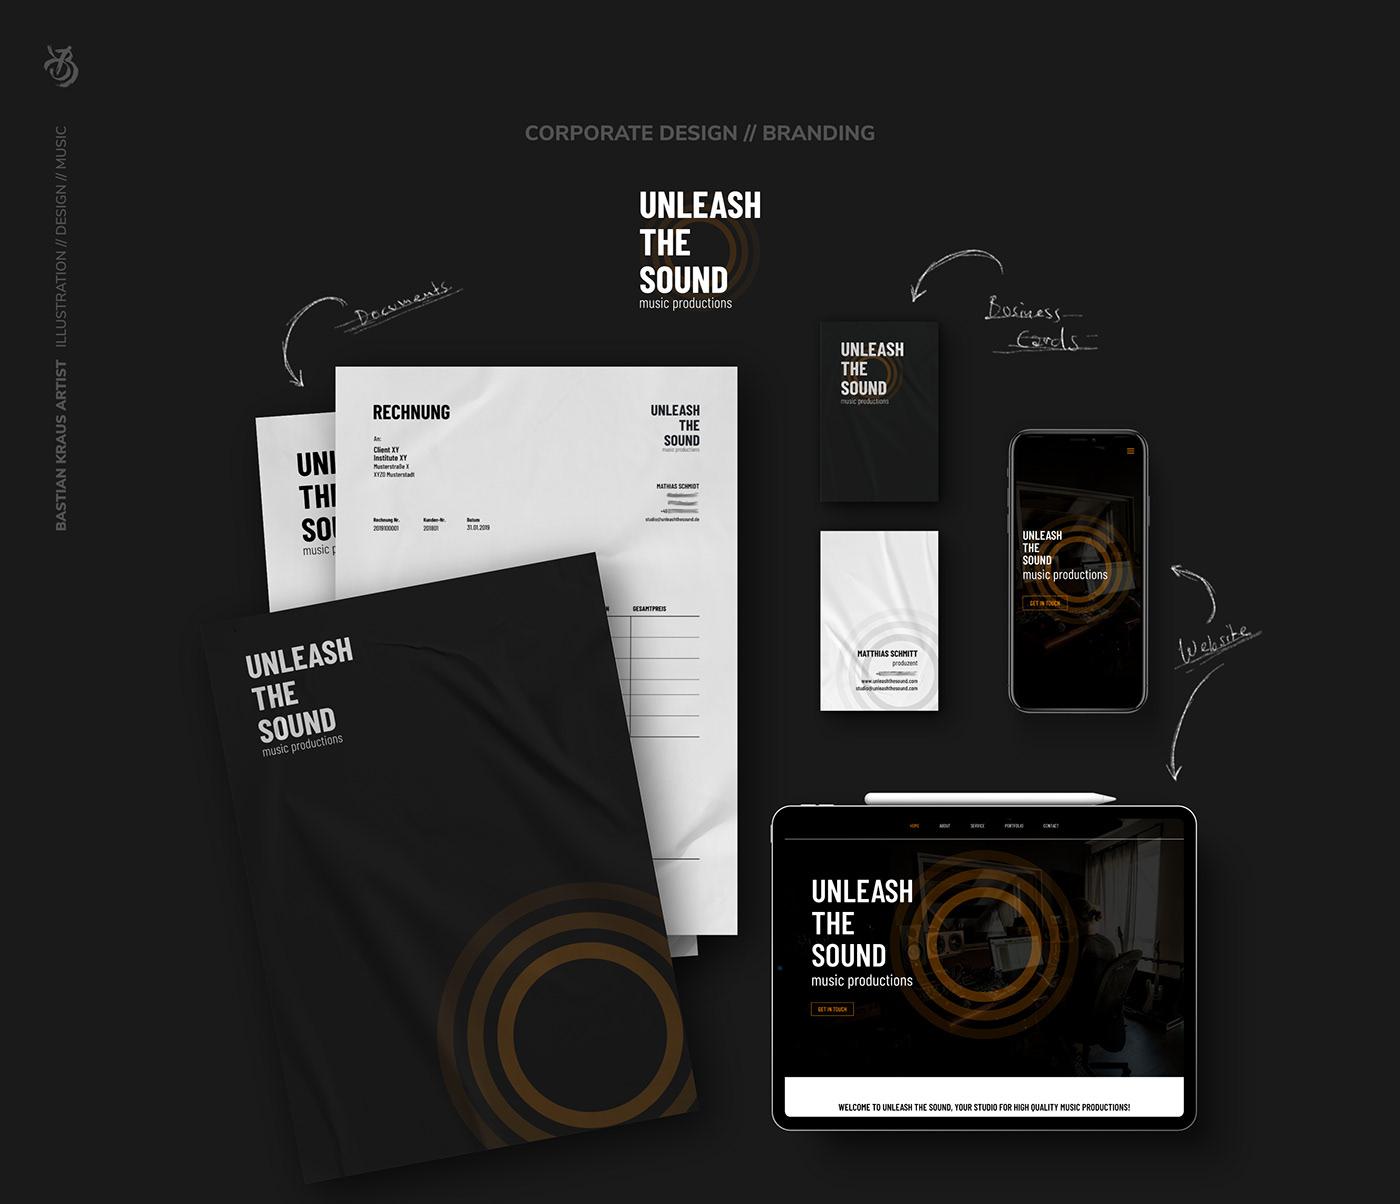 Unleash The Sound // Corporate Design + Branding